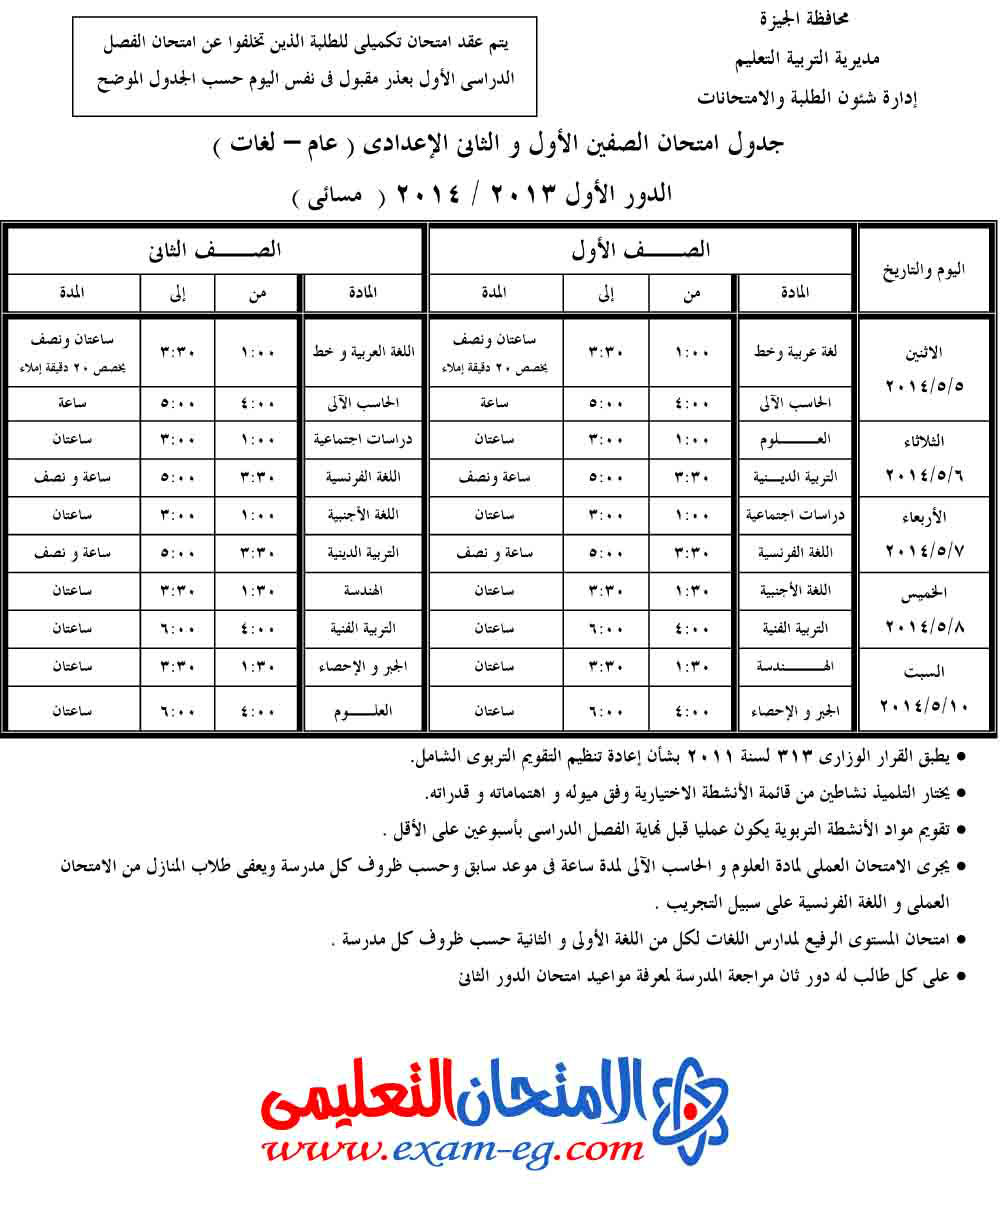 exam-eg.com_1397580096376.jpg